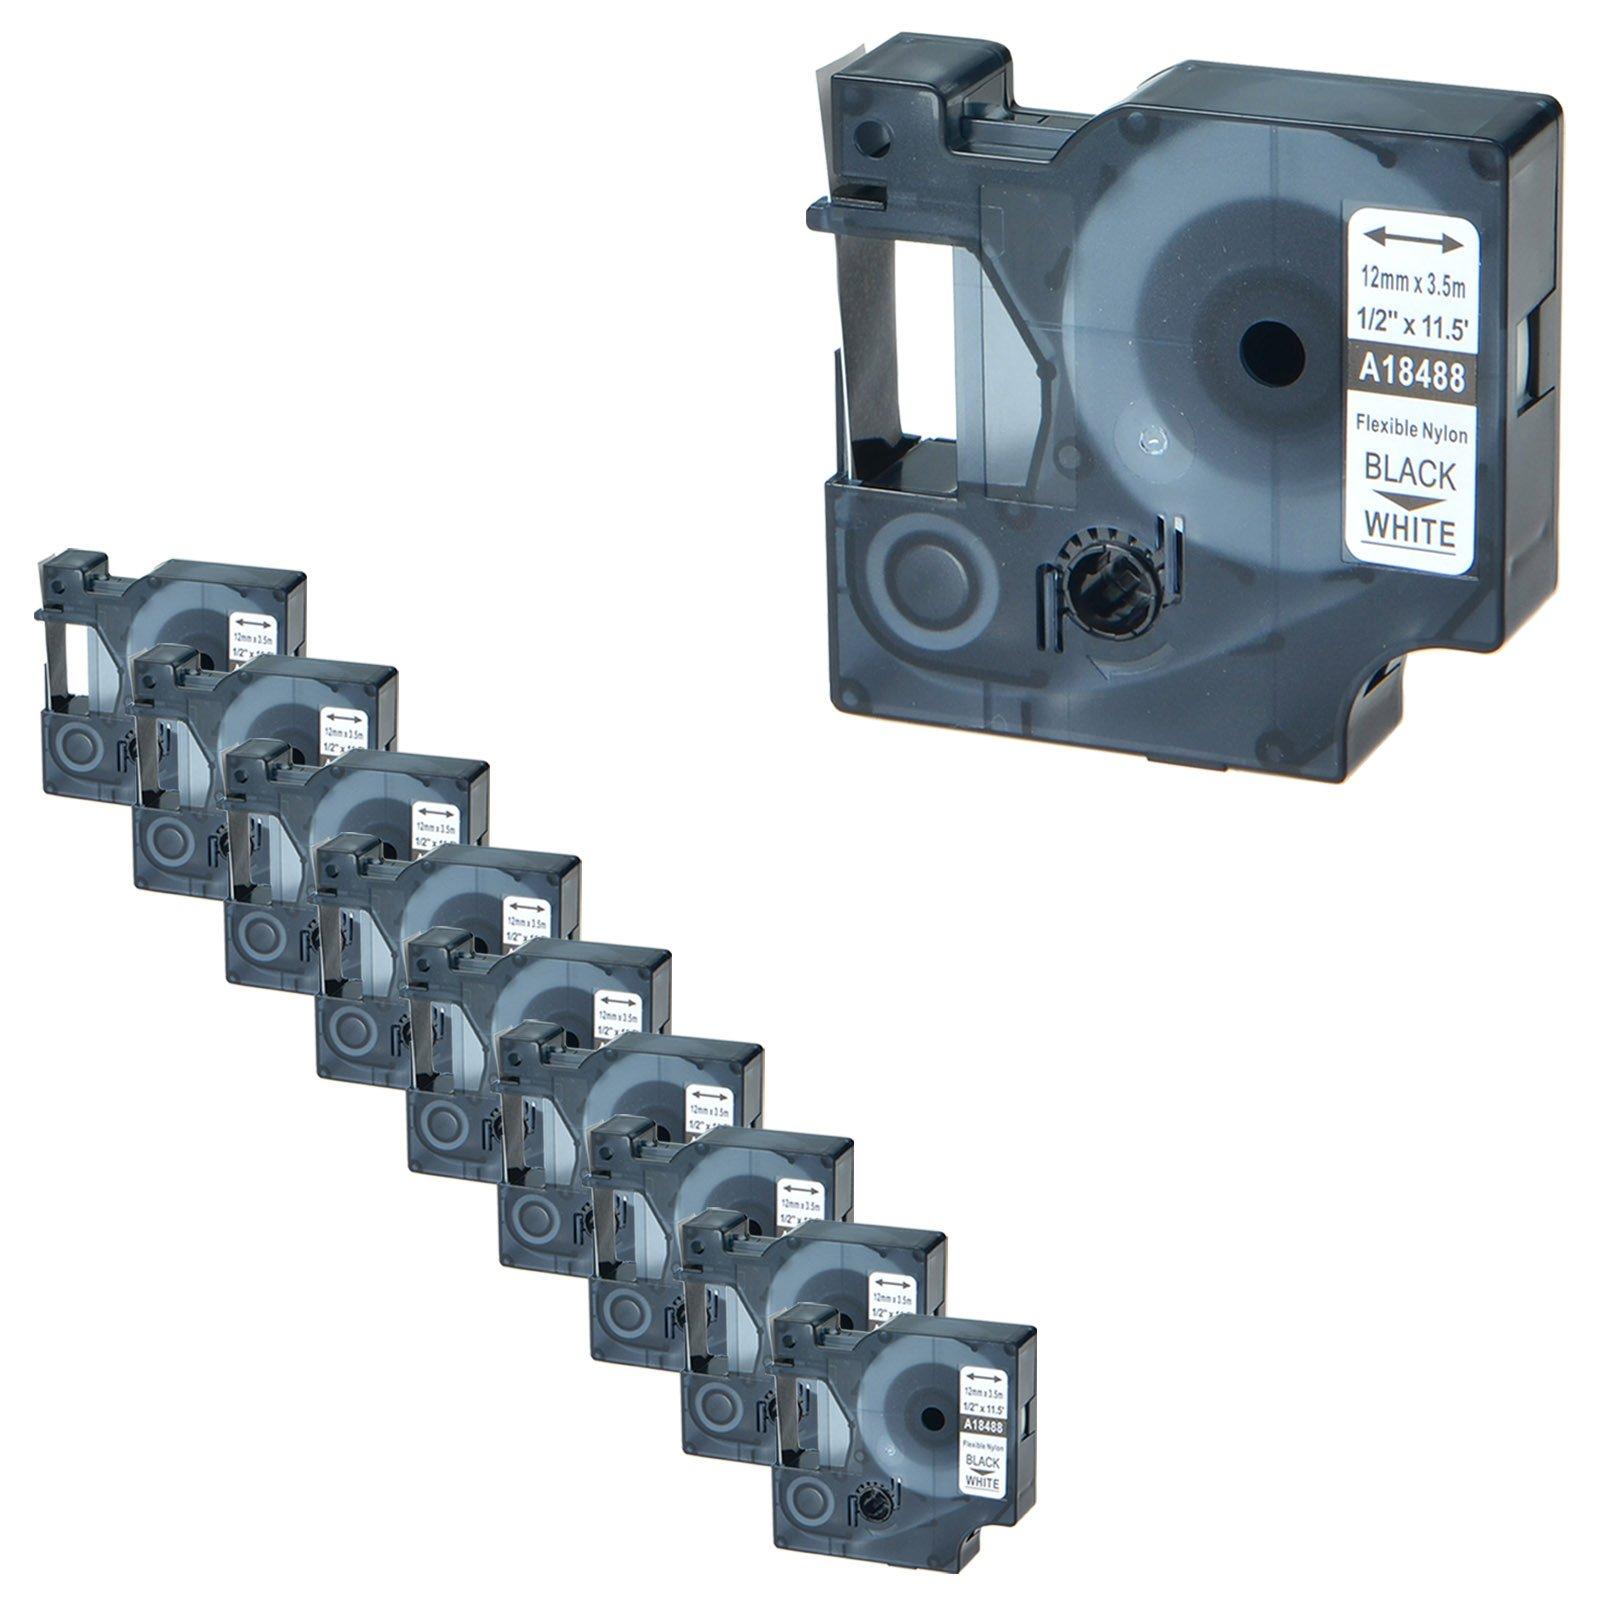 NineLeaf 10 Pack Black on White Flexible Nylon Industrial Label Tape Compatible for Dymo 18488 Rhino 4200 5000 5200 6000 Label Maker (1/2''x11.5ft)